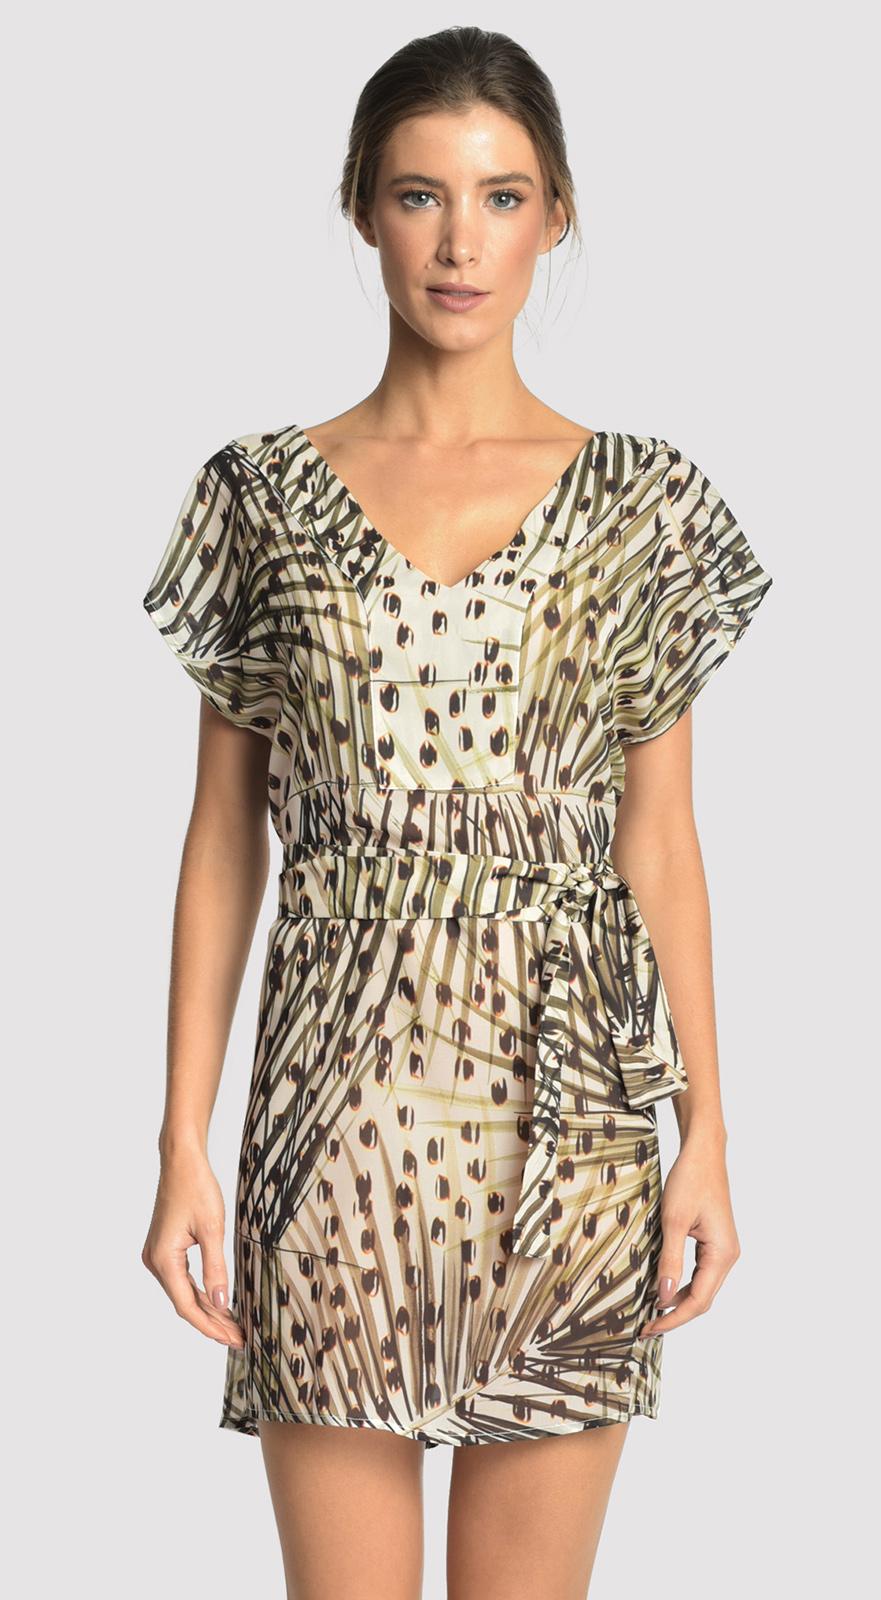 d3c2ec2d6b Maxi Dresses Beach Mini Dress In Leopard Print - Basic Strip Cheetah